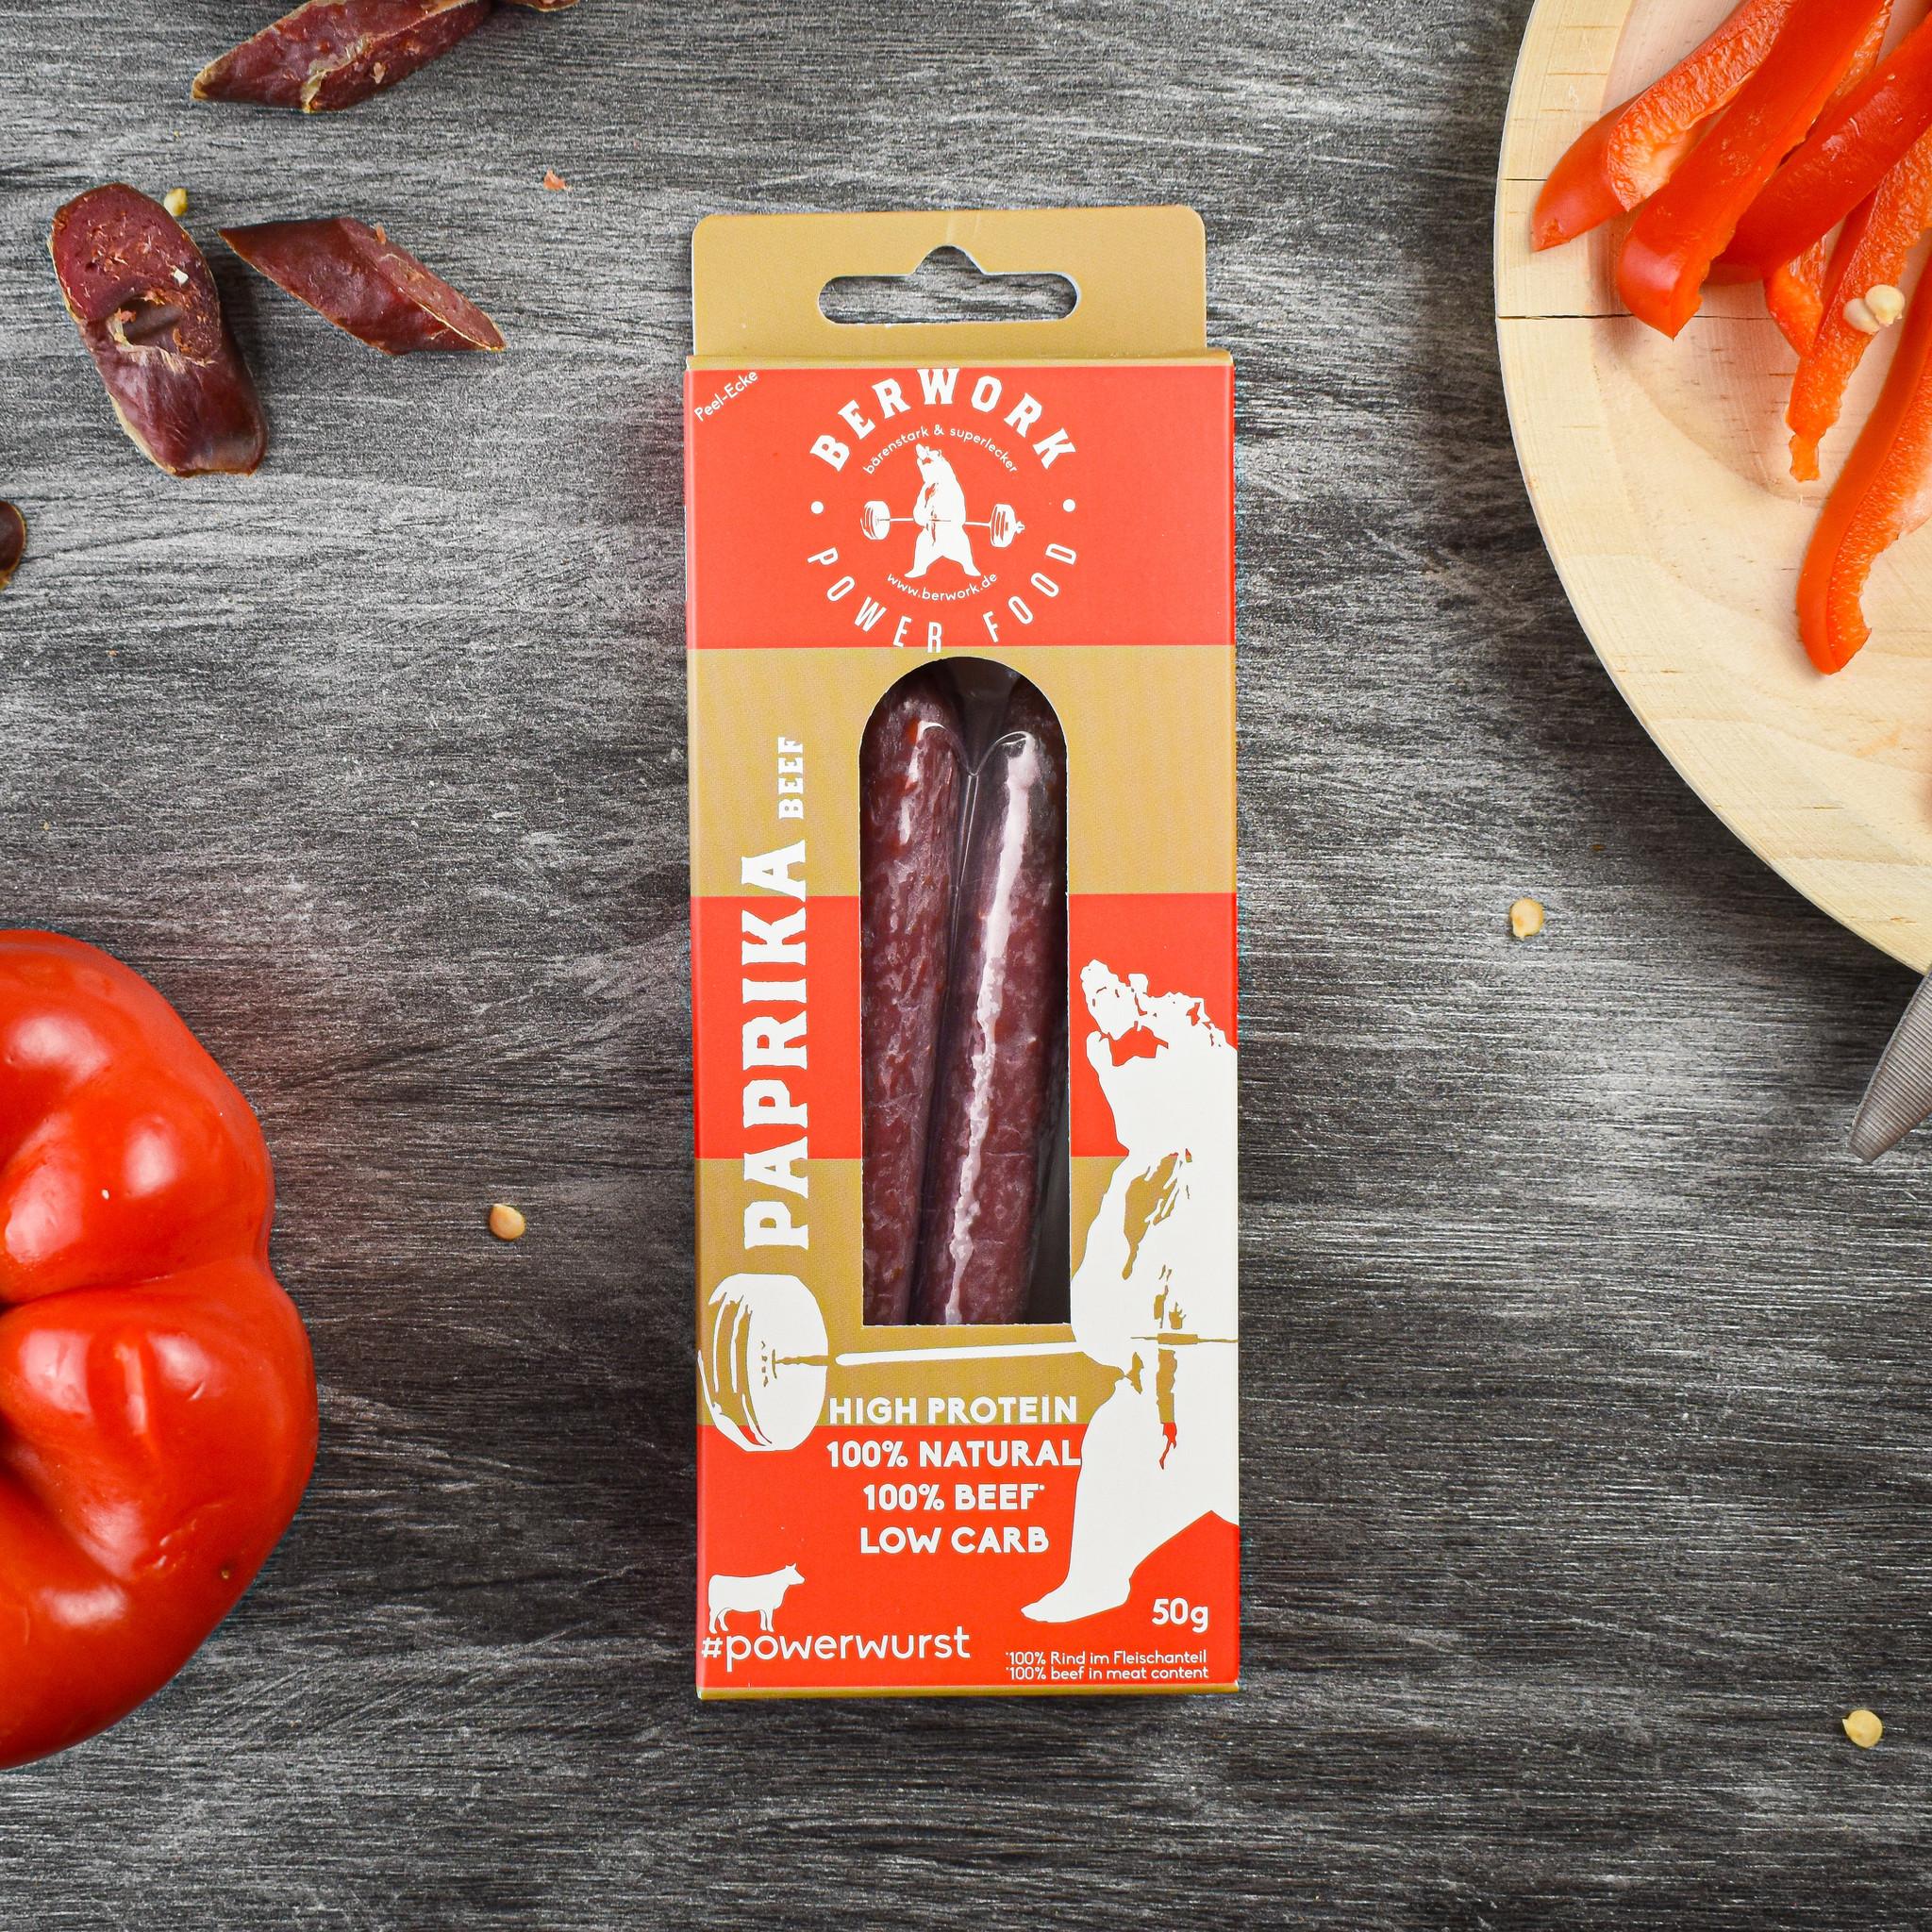 berwork Powerwurst Paprika Rind (50g)